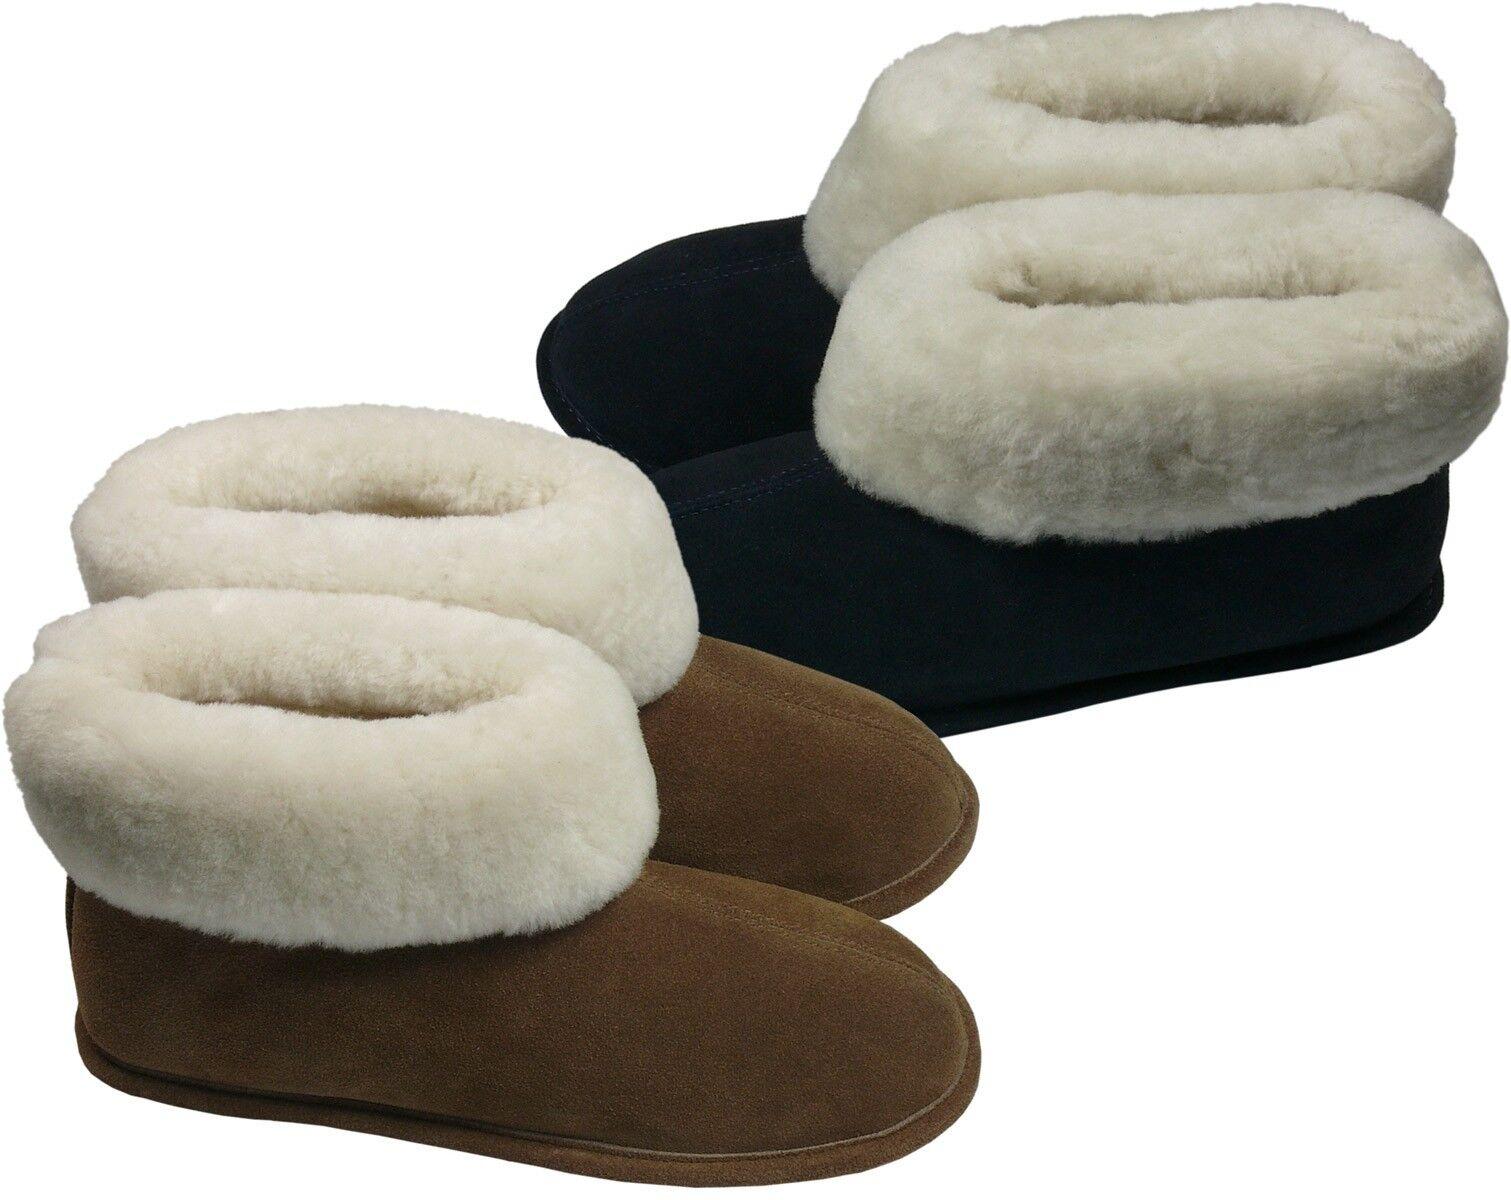 Extra Dicke Lammfellschuhe mit Ledersohle in 2 Farben Hauschuh Hausschuhe